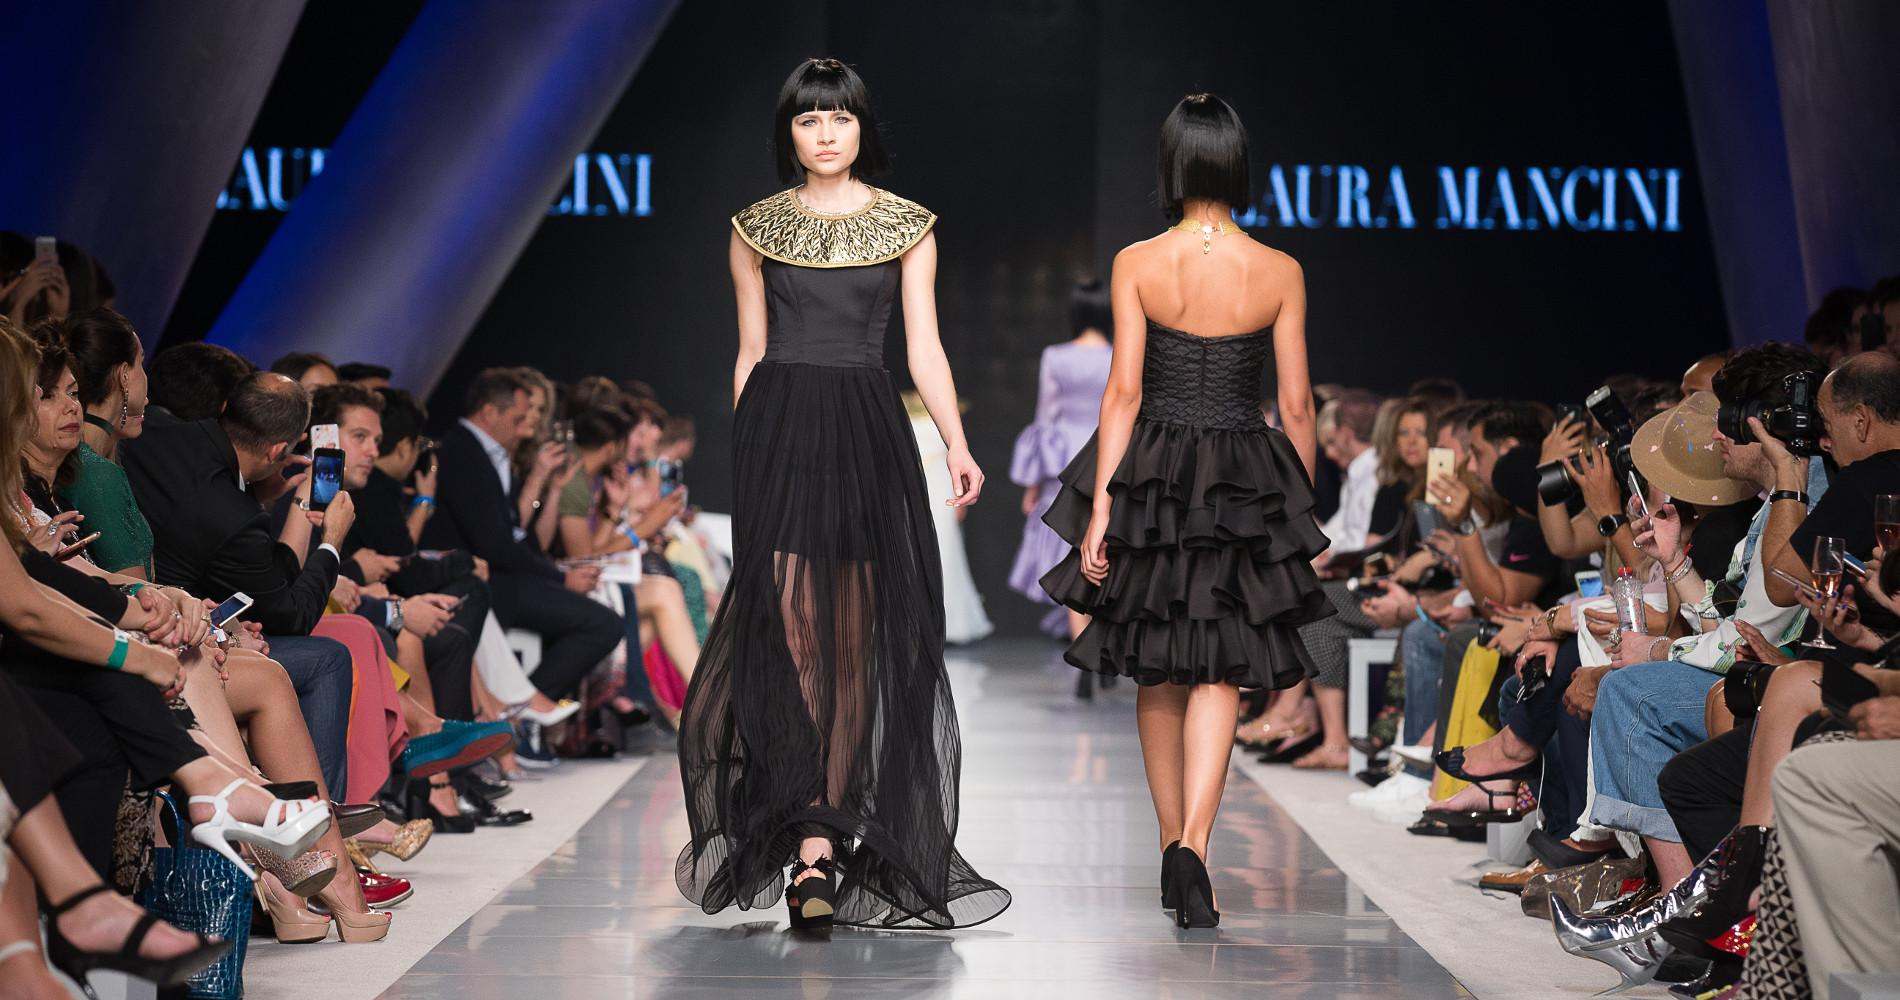 Quelle tendance mode après la fashion week ?